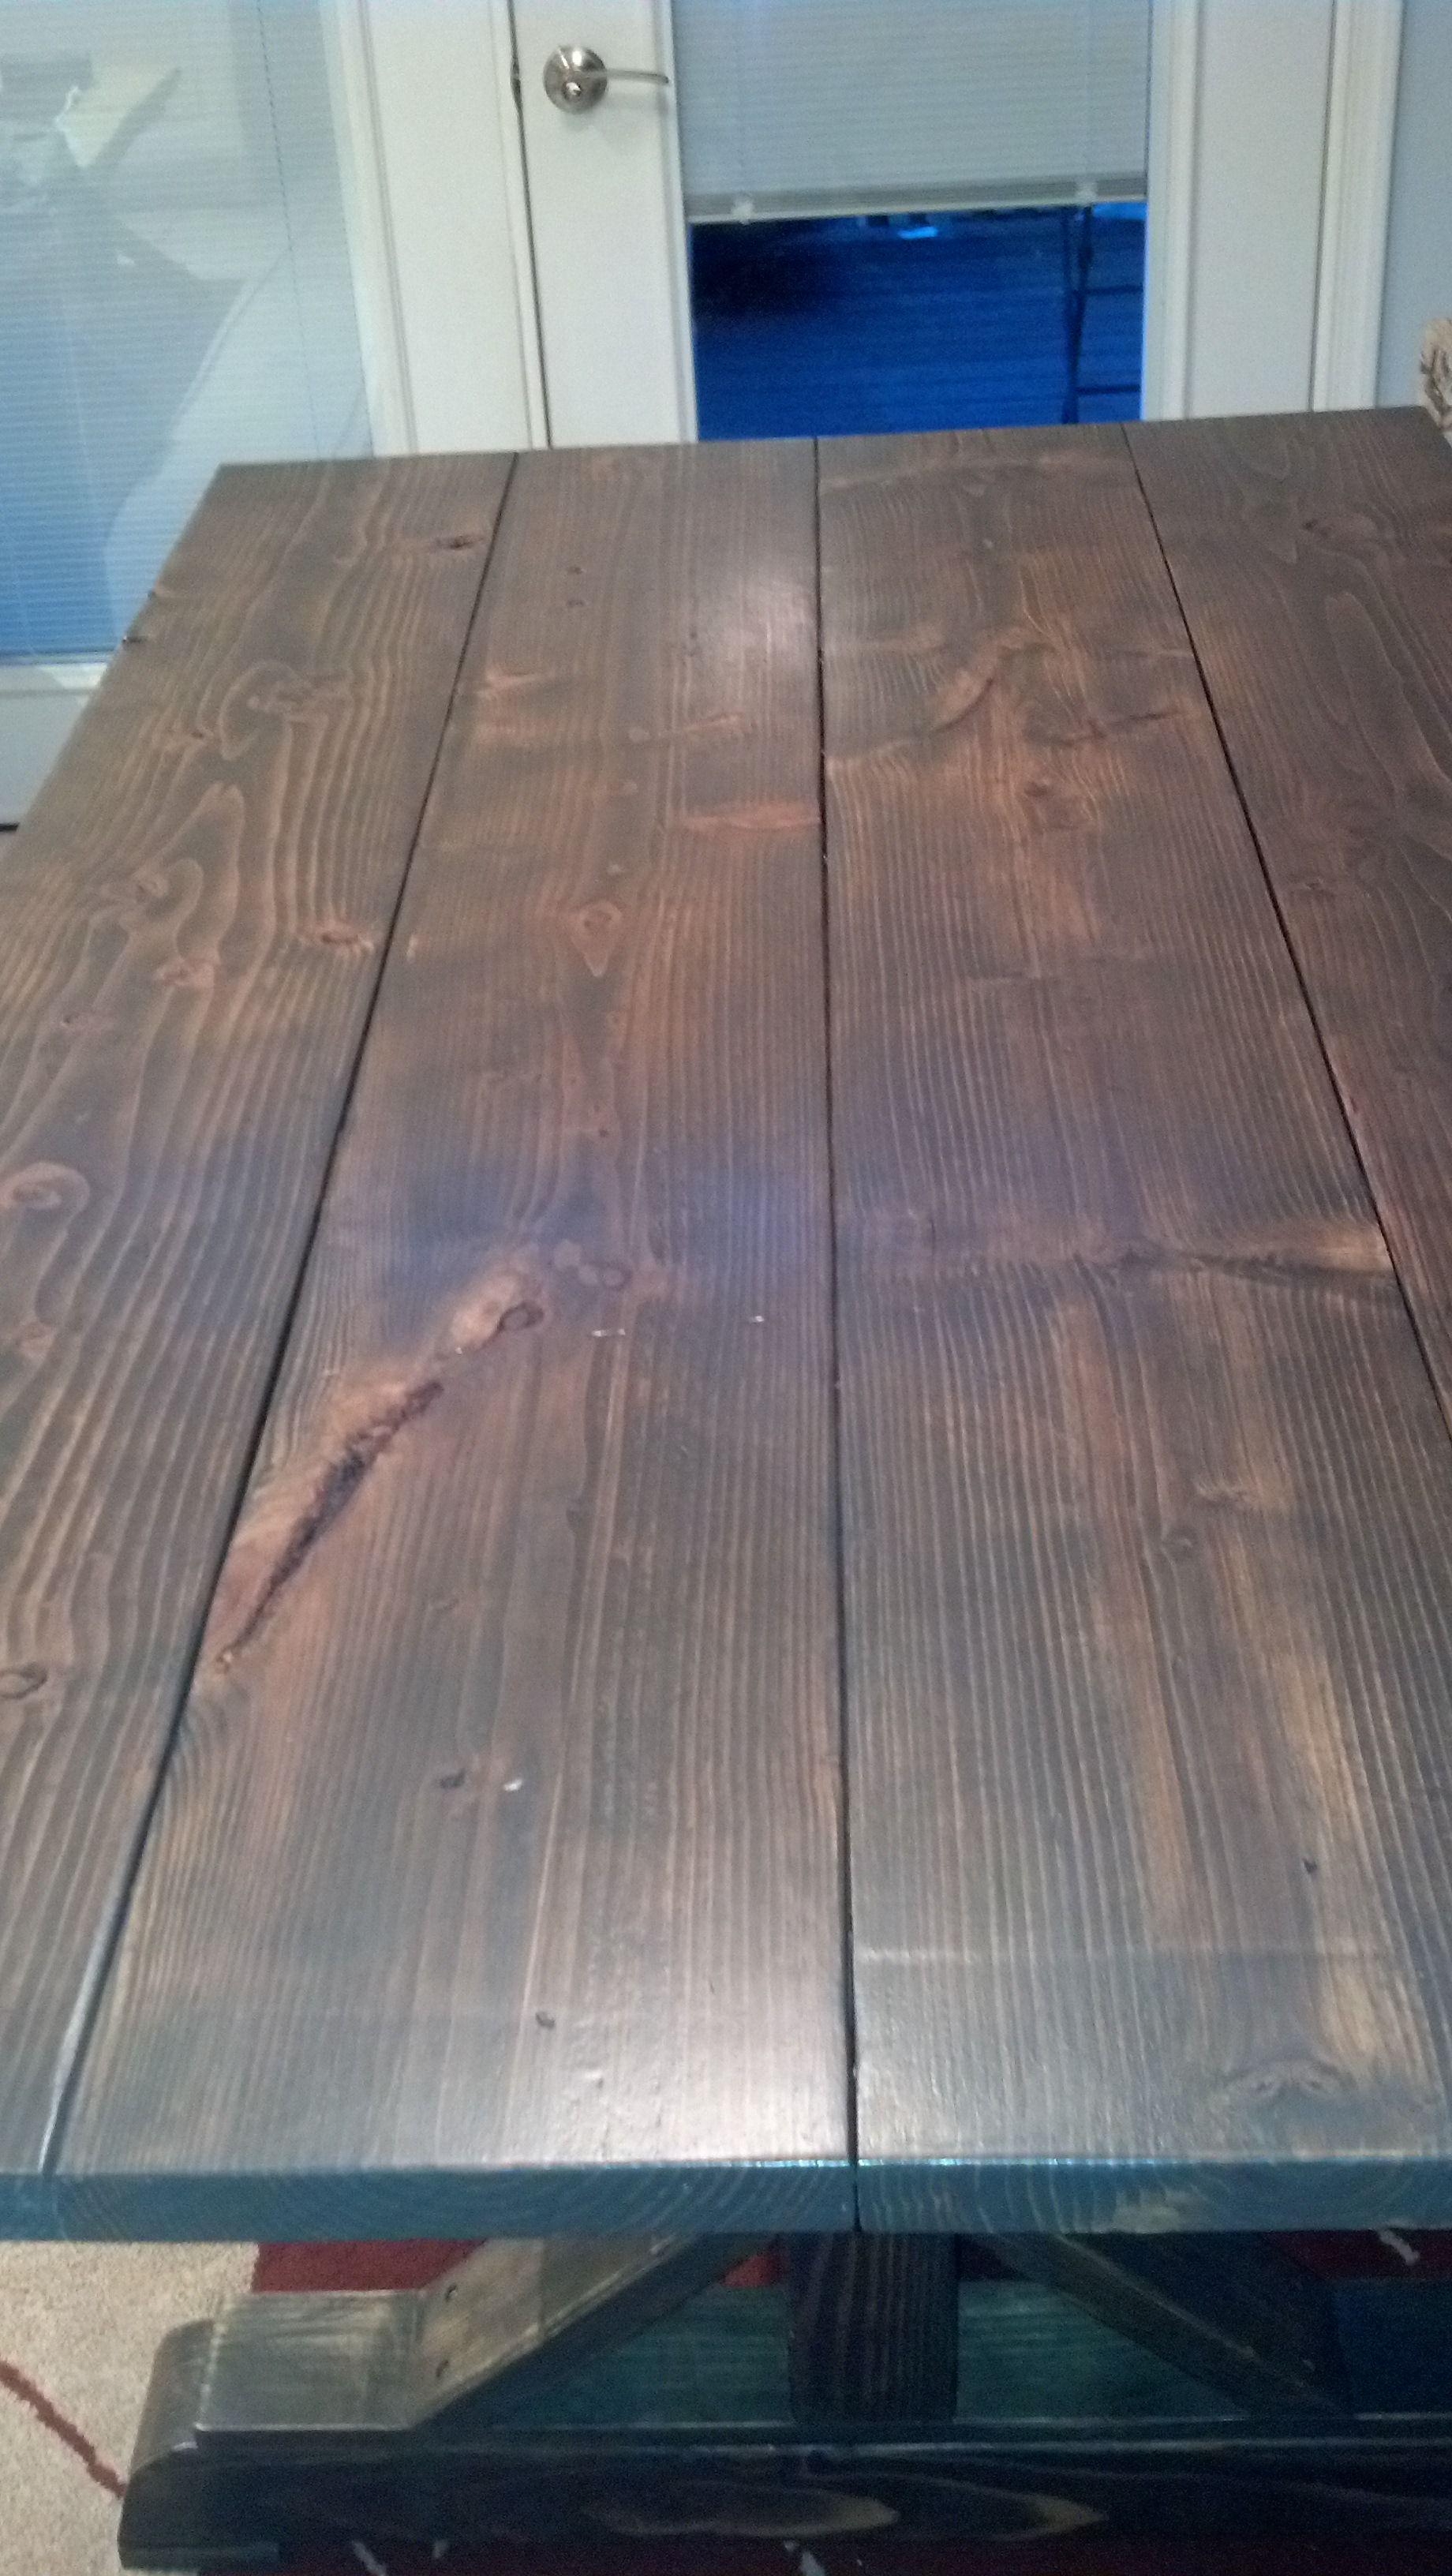 Rustoleum Driftwood Stain 50 Rustoleum Sunbleached 50 Rustoleum Dark Walnut Then 1 Coat